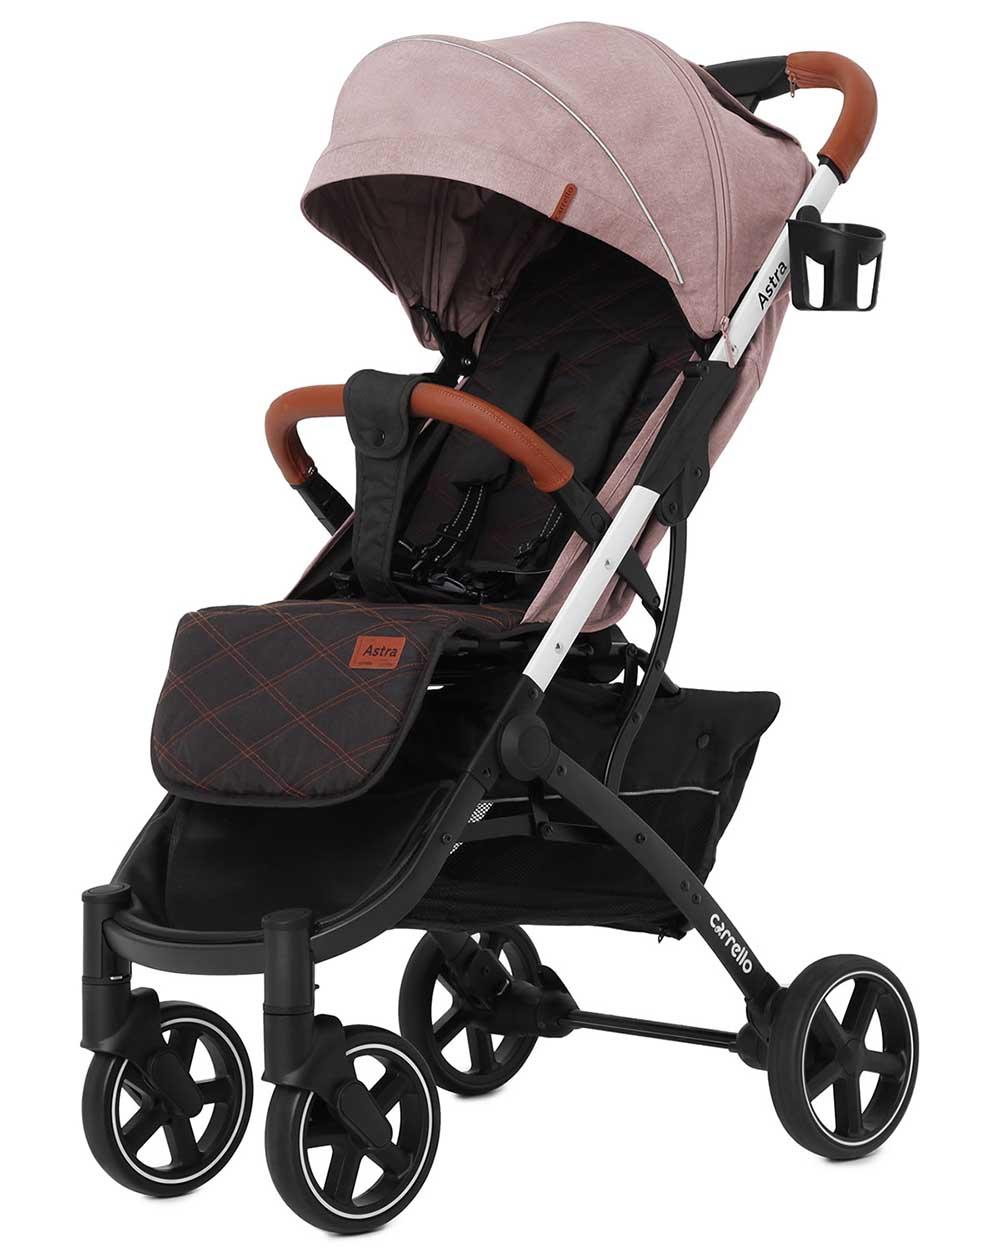 Детская коляска CARRELLO Astra CRL-5505 Apricot Pink